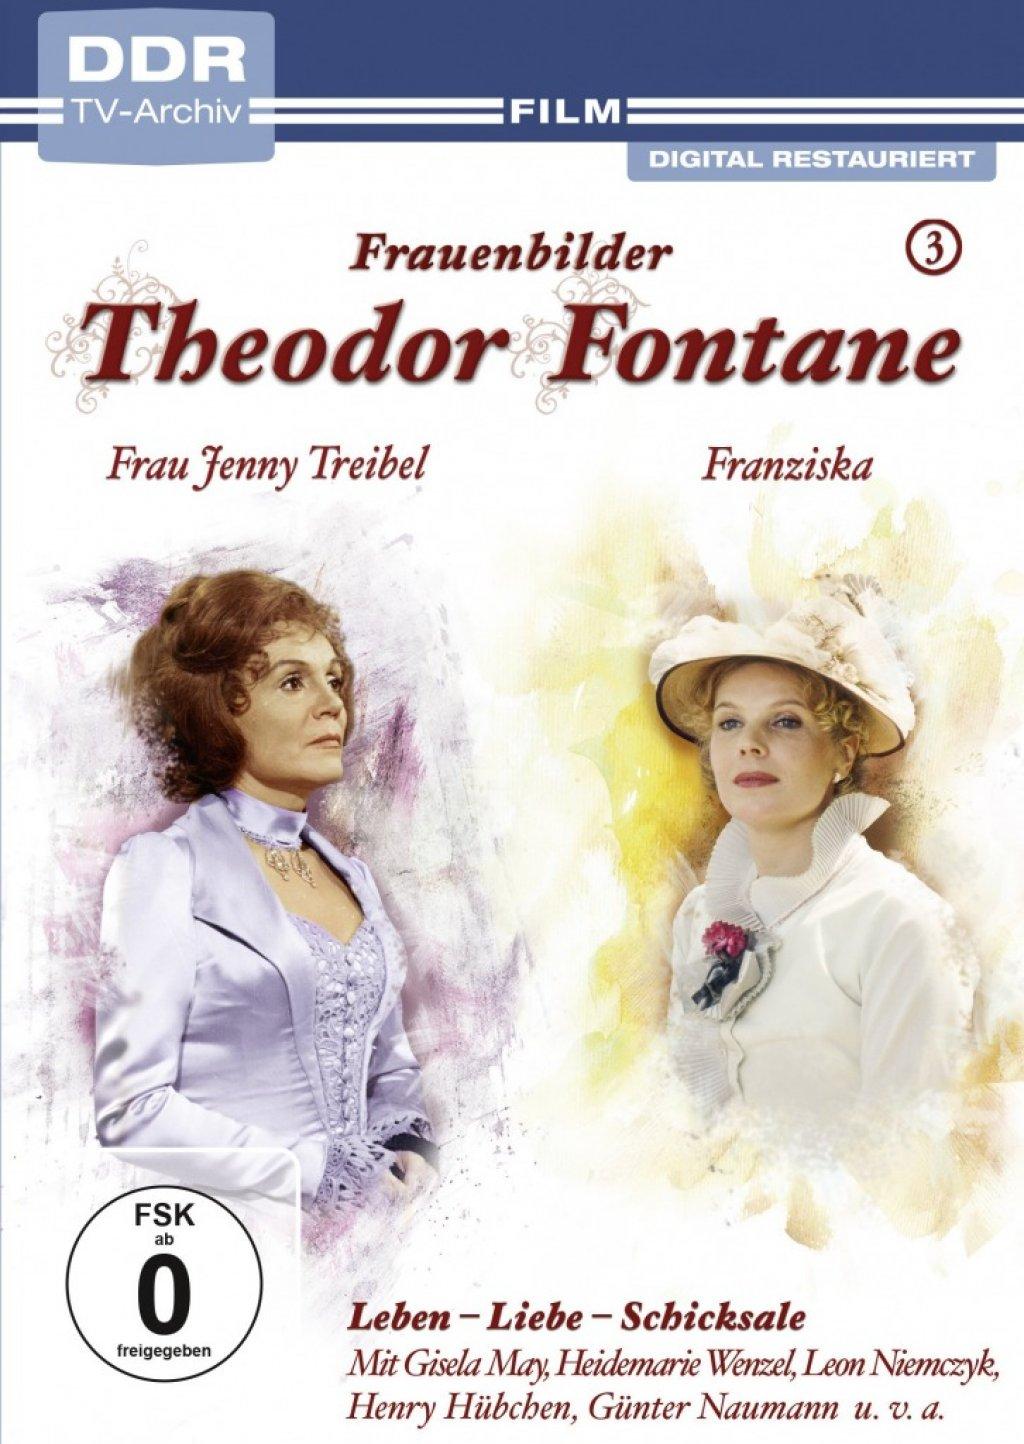 Theodor Fontane: Frauenbilder - Vol. 3 / DDR TV-Archiv (DVD)